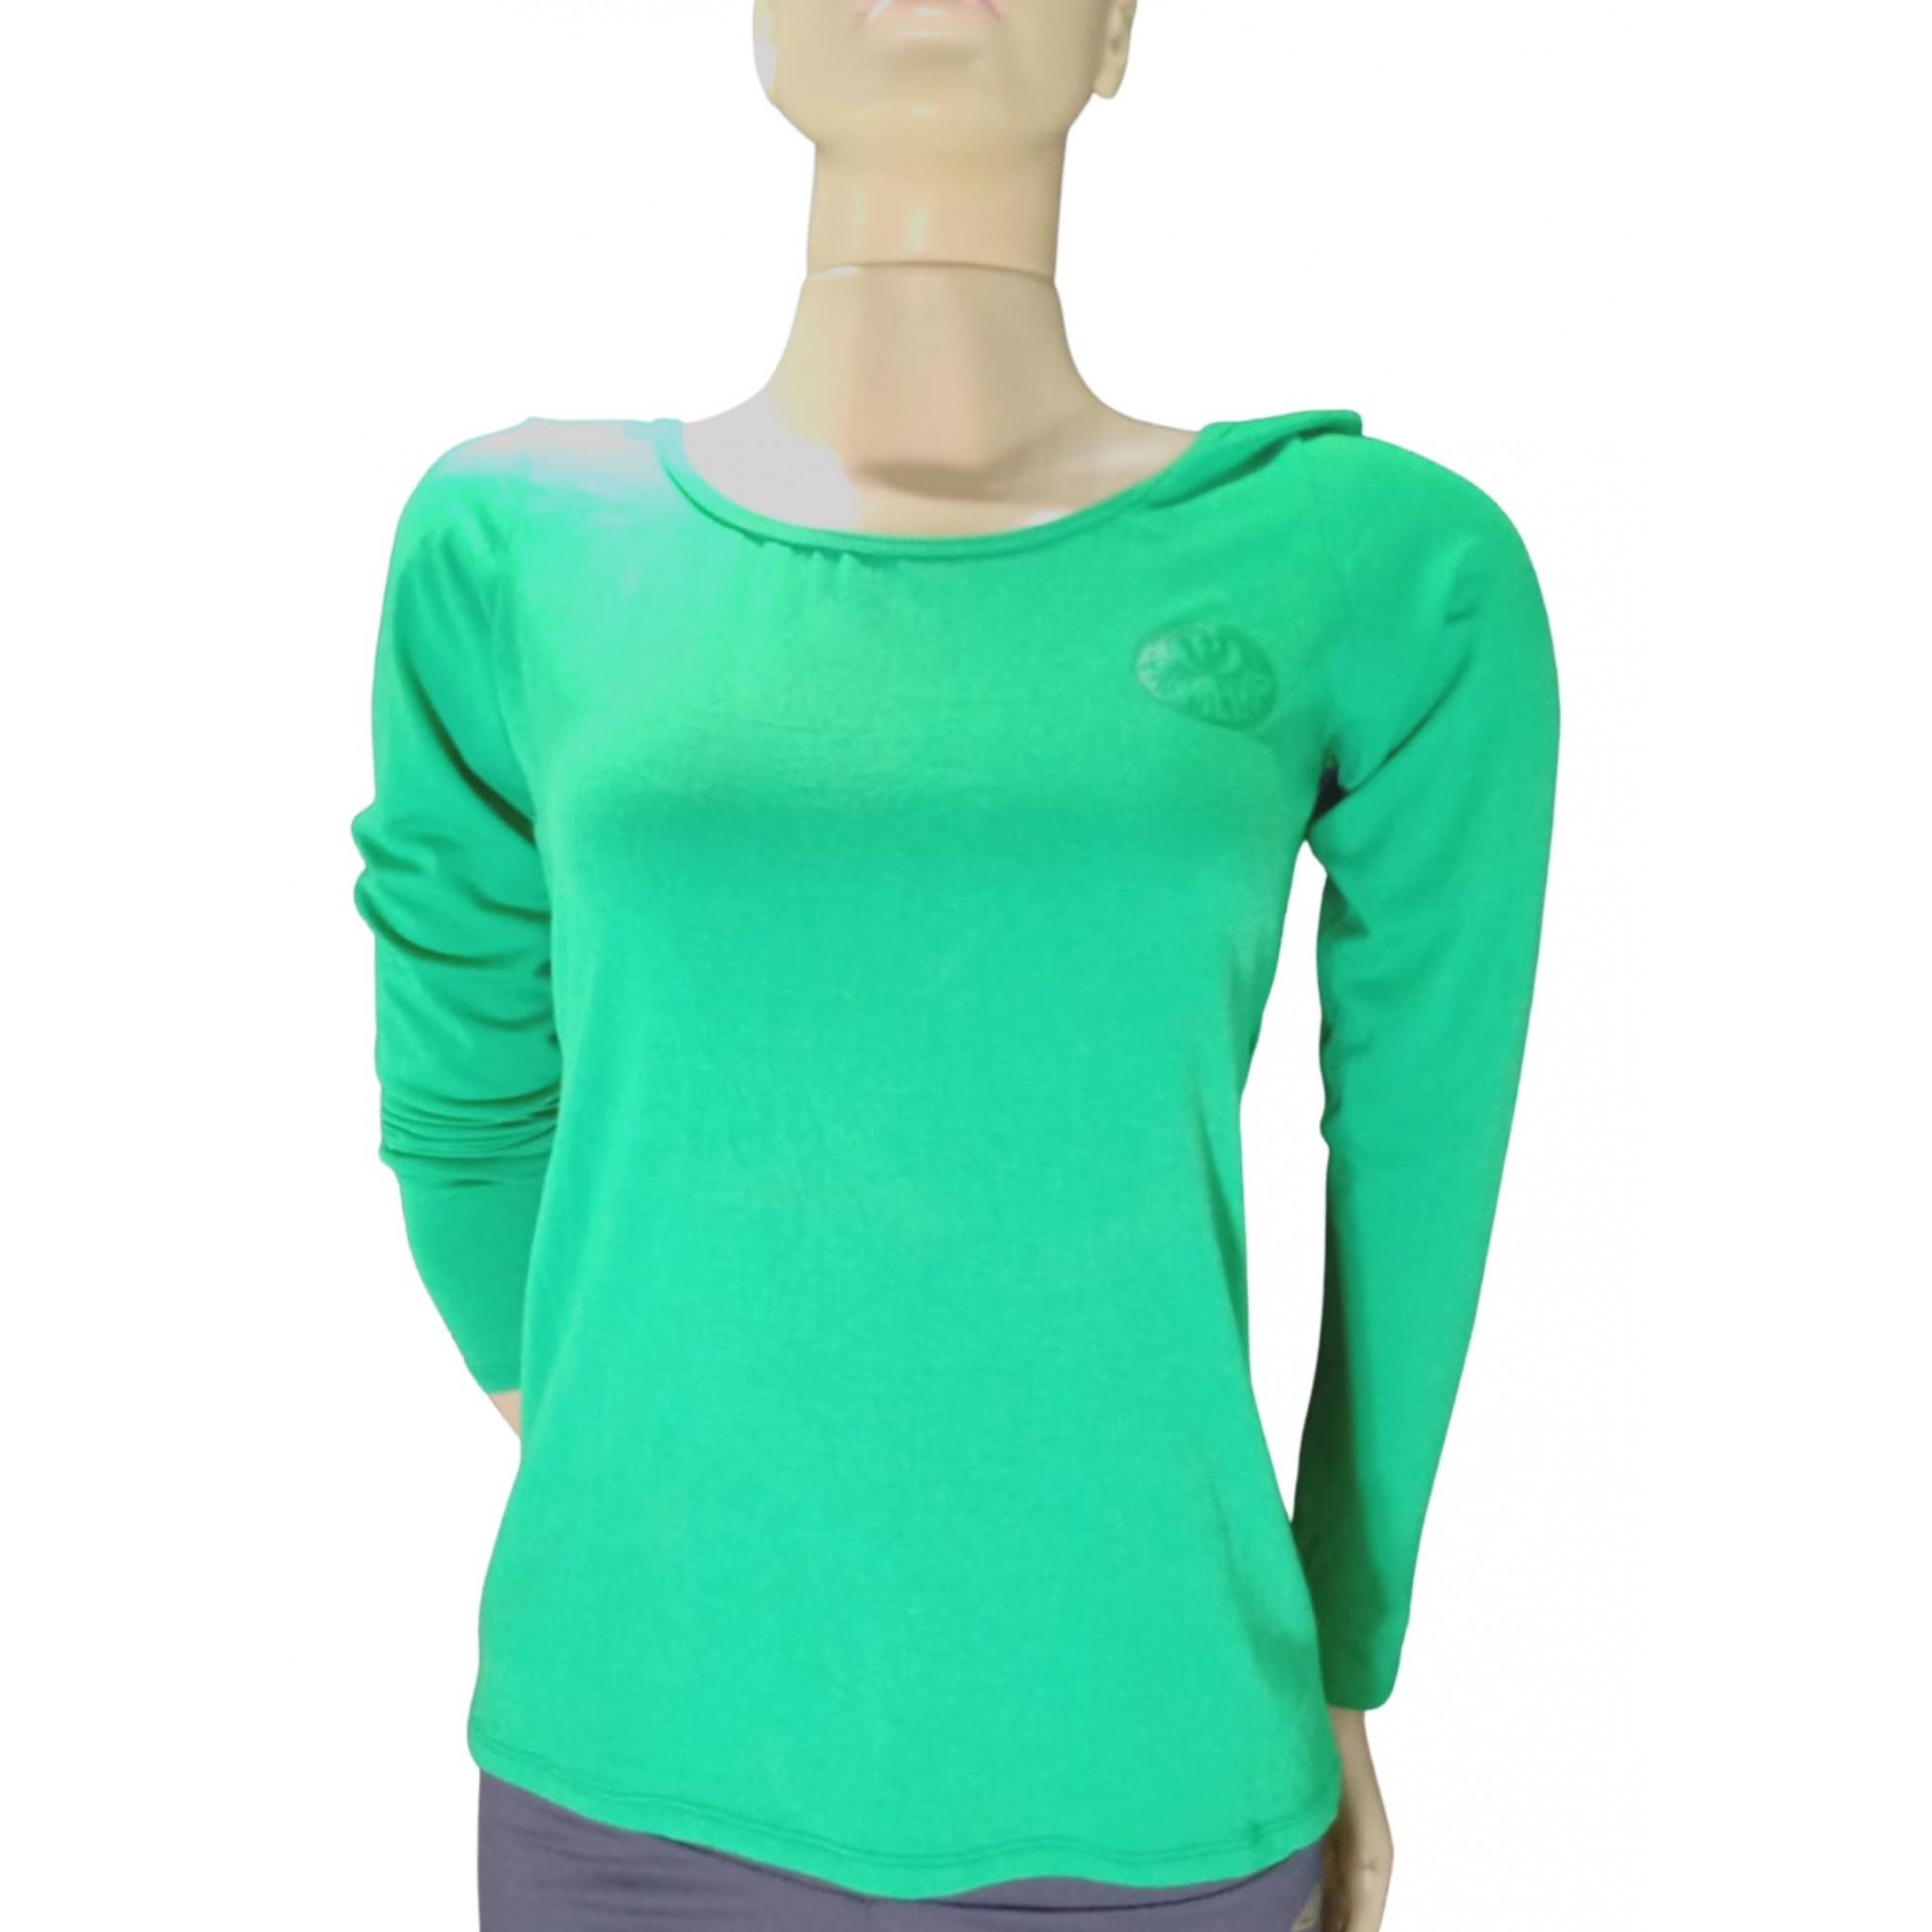 Camisa Palmeiras feminina manga longa